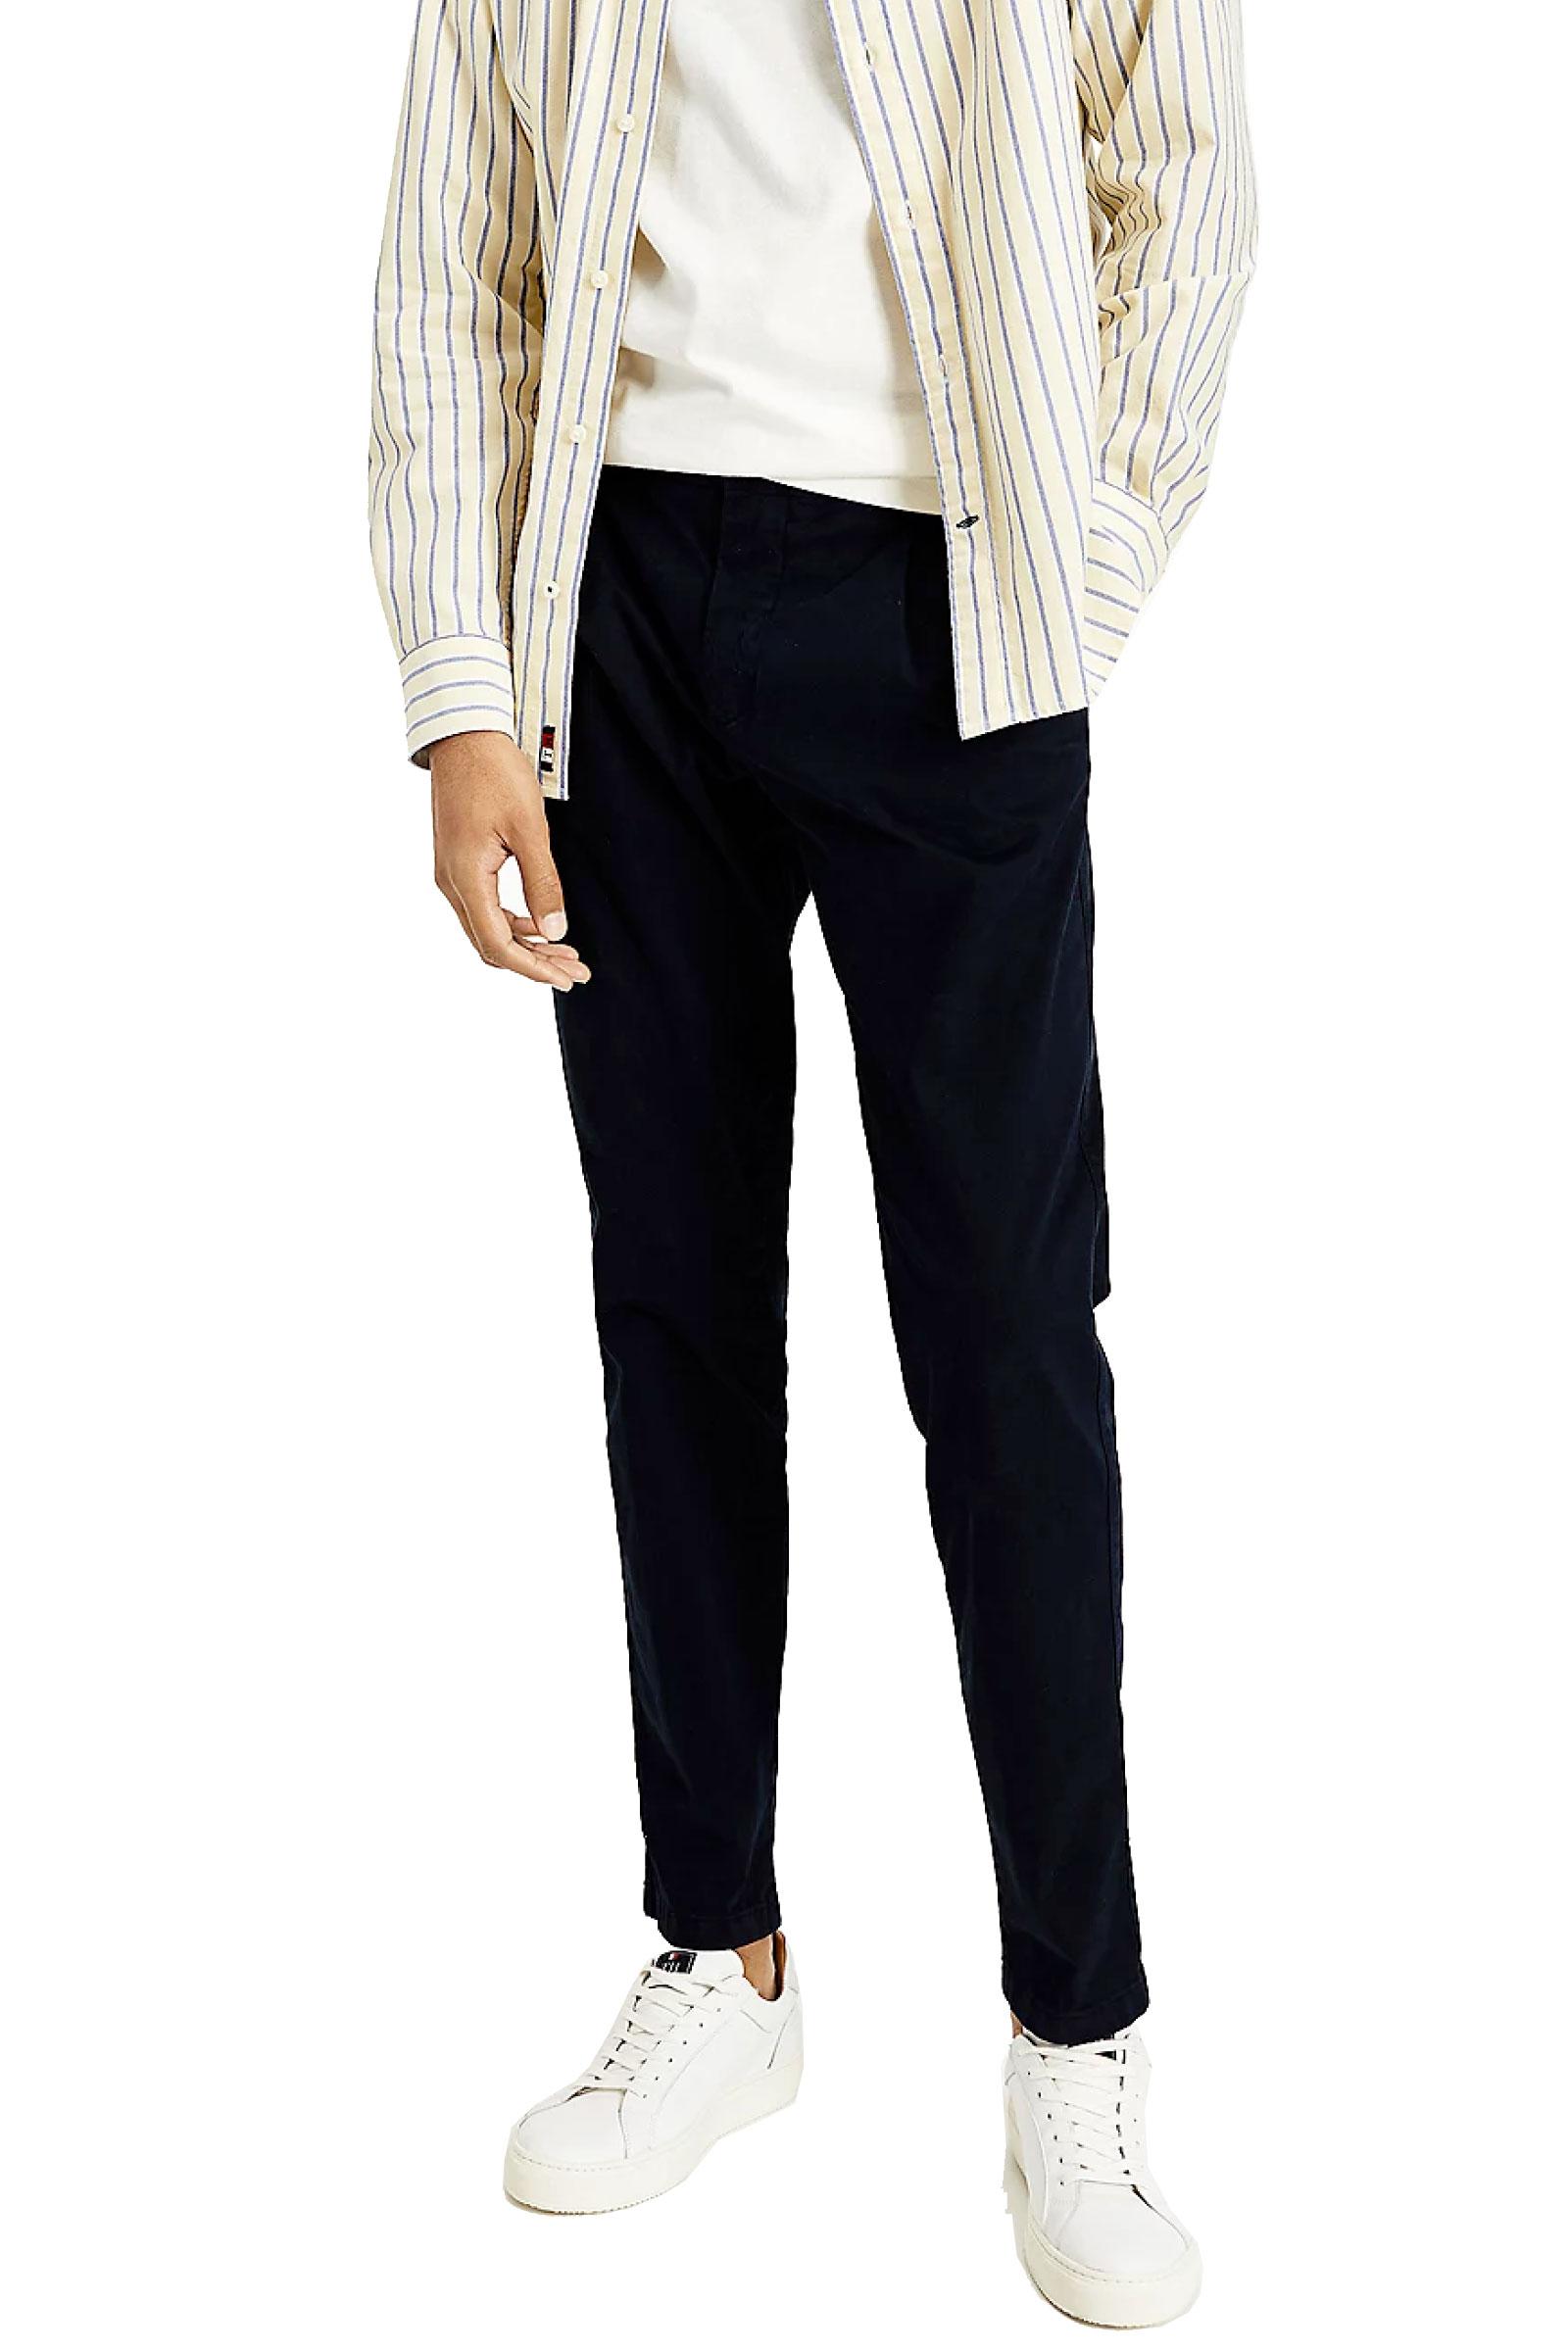 TOMMY HILFIGER Pantalone Uomo TOMMY HILFIGER | Pantalone | MW0MW17931DW5